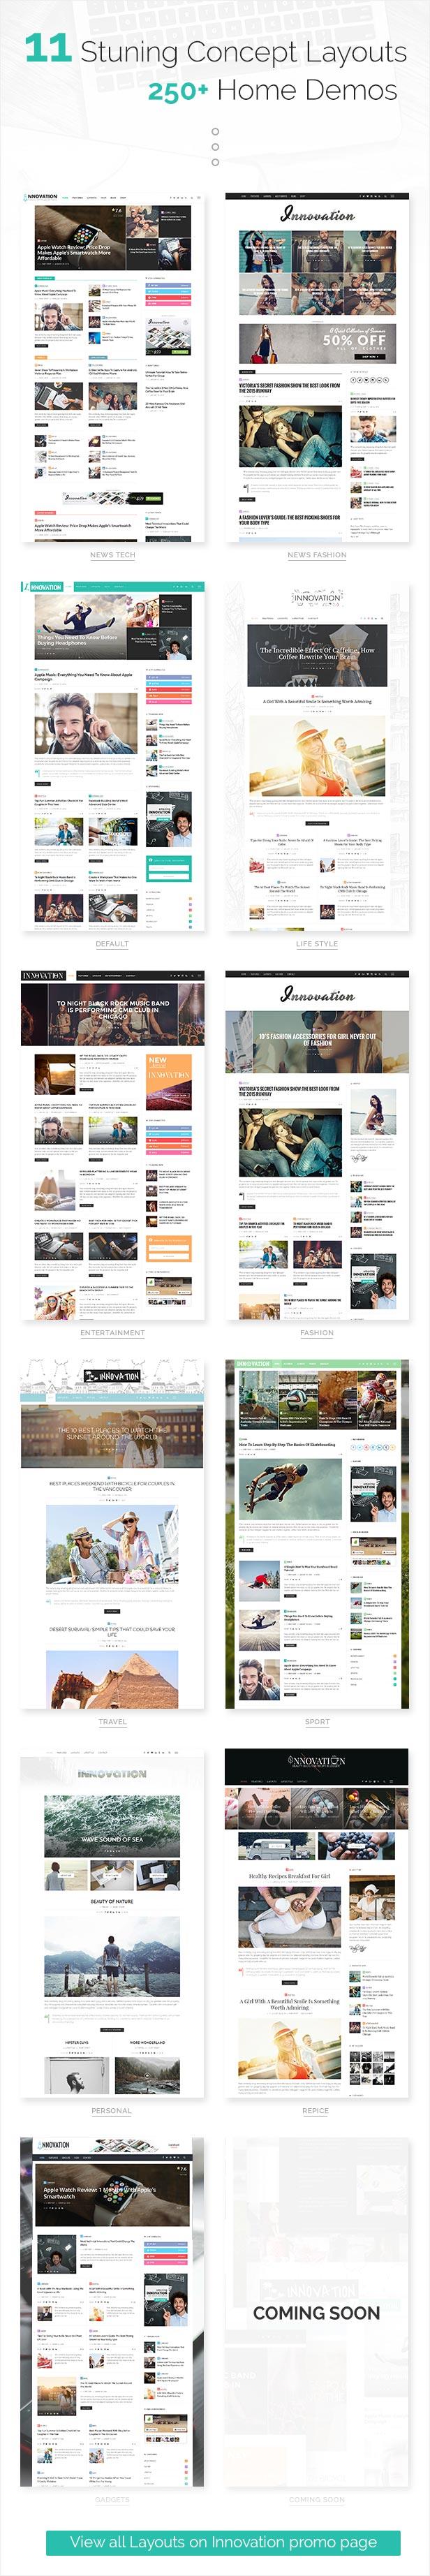 Innovation: Multi-Concept News, Magazine & Blog Theme - 4